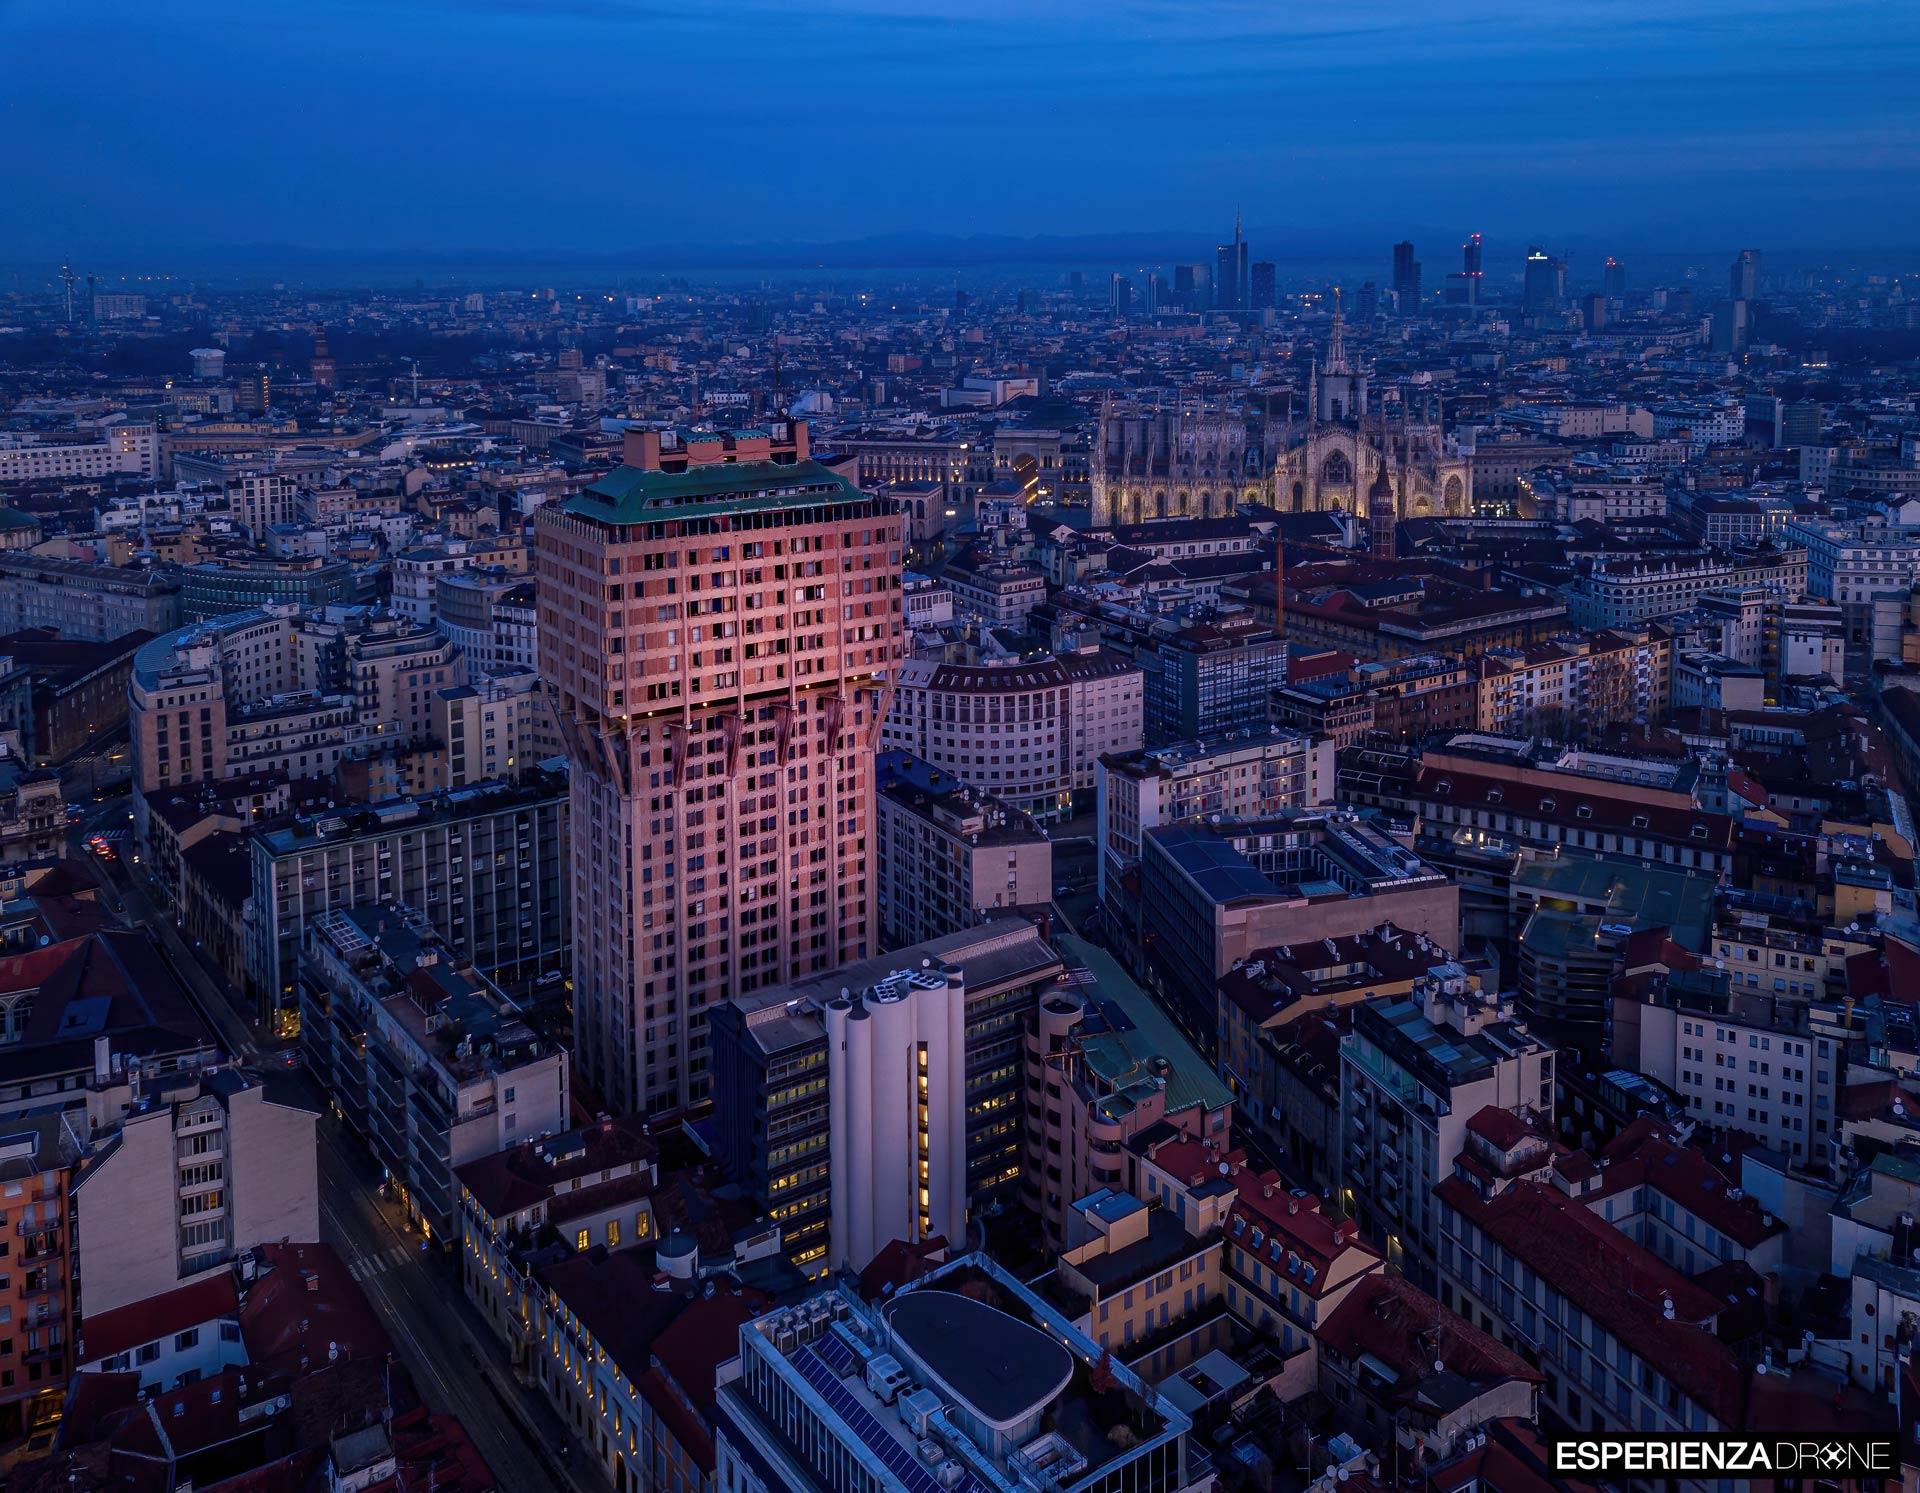 esperienza drone portfolio fotografia aerea architettura milano torre velasca tre.jpg